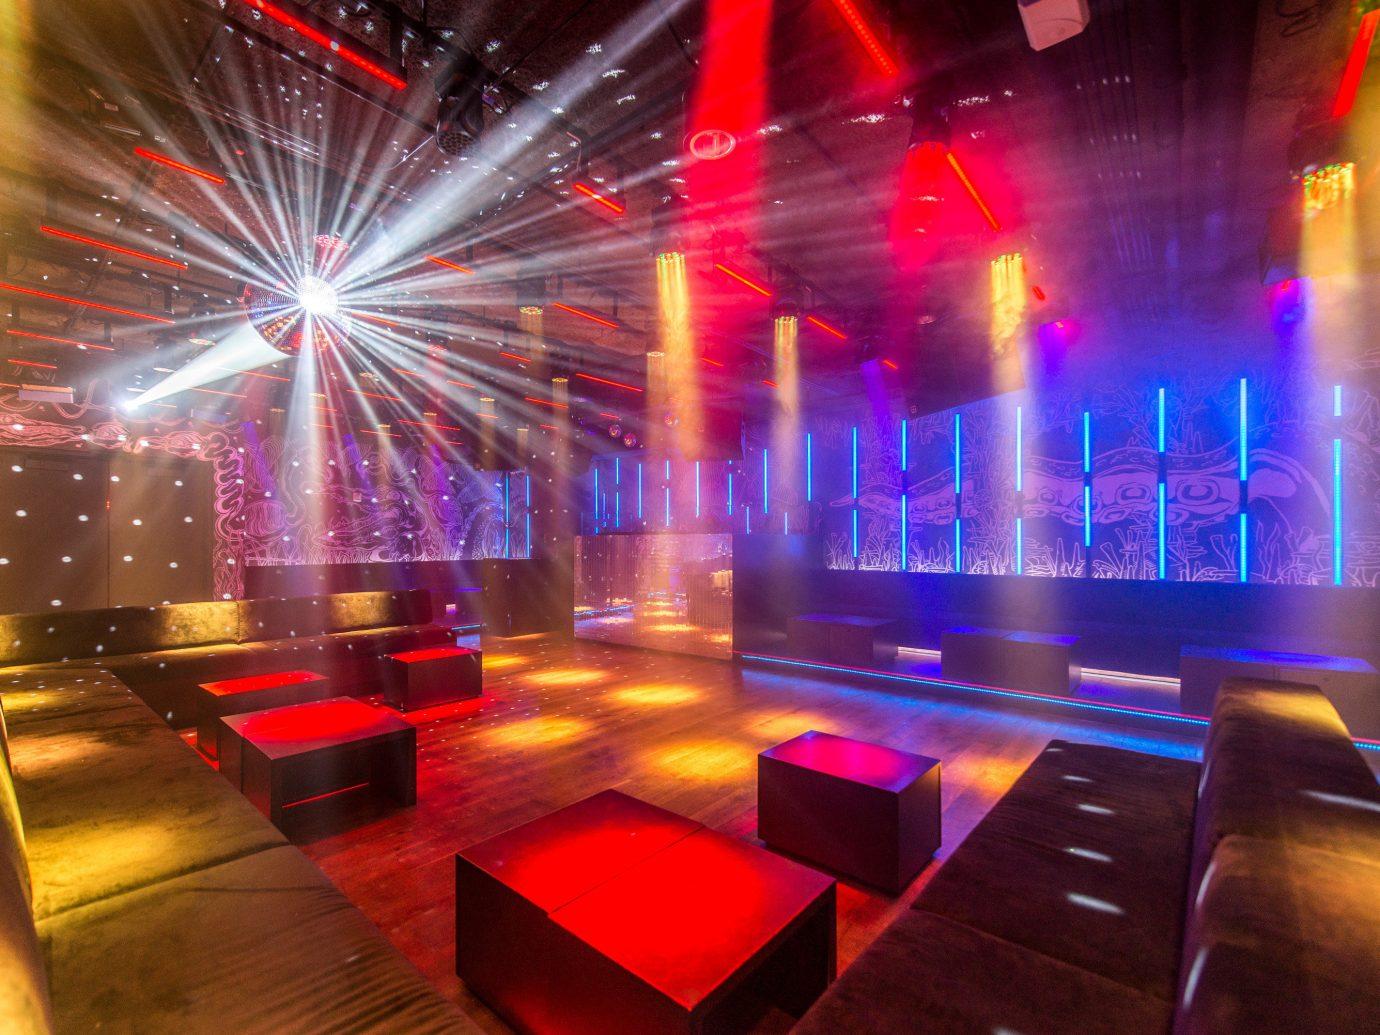 Food + Drink floor indoor nightclub disco stage light music venue function hall musical theatre laser blur